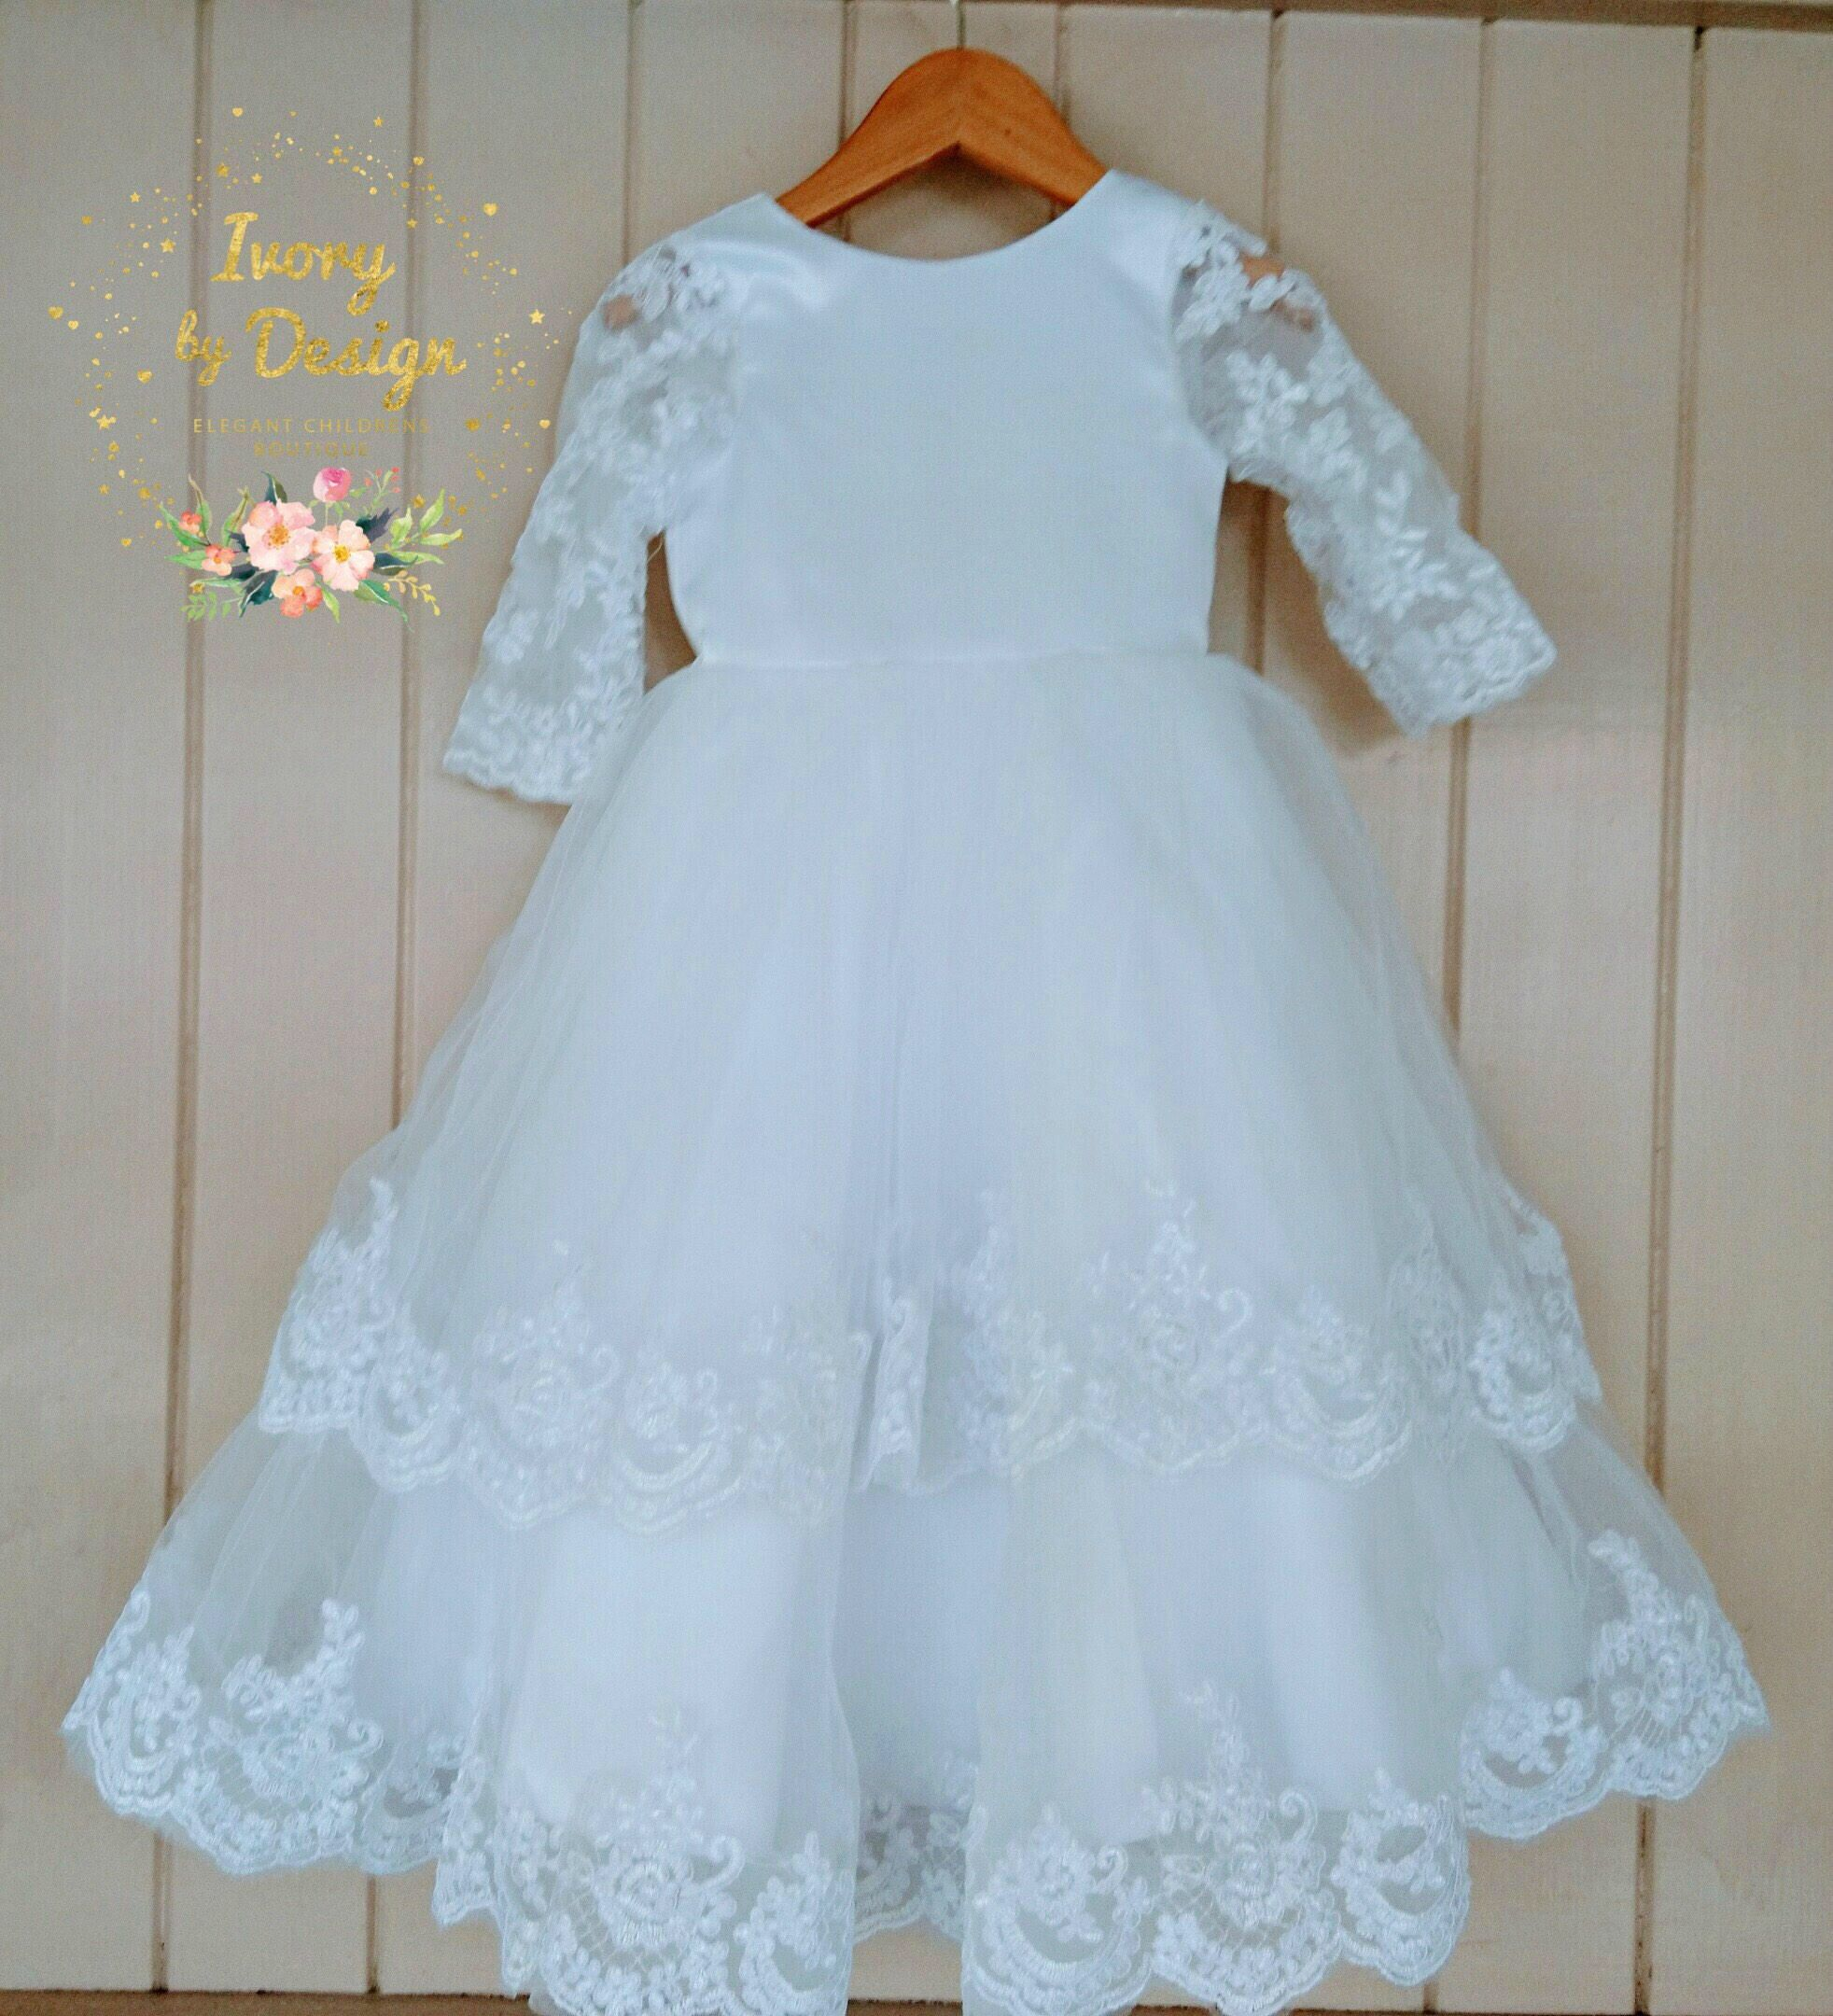 White Lace long Sleeve Flower Girl Tulle Satin Dress Baby Baptism